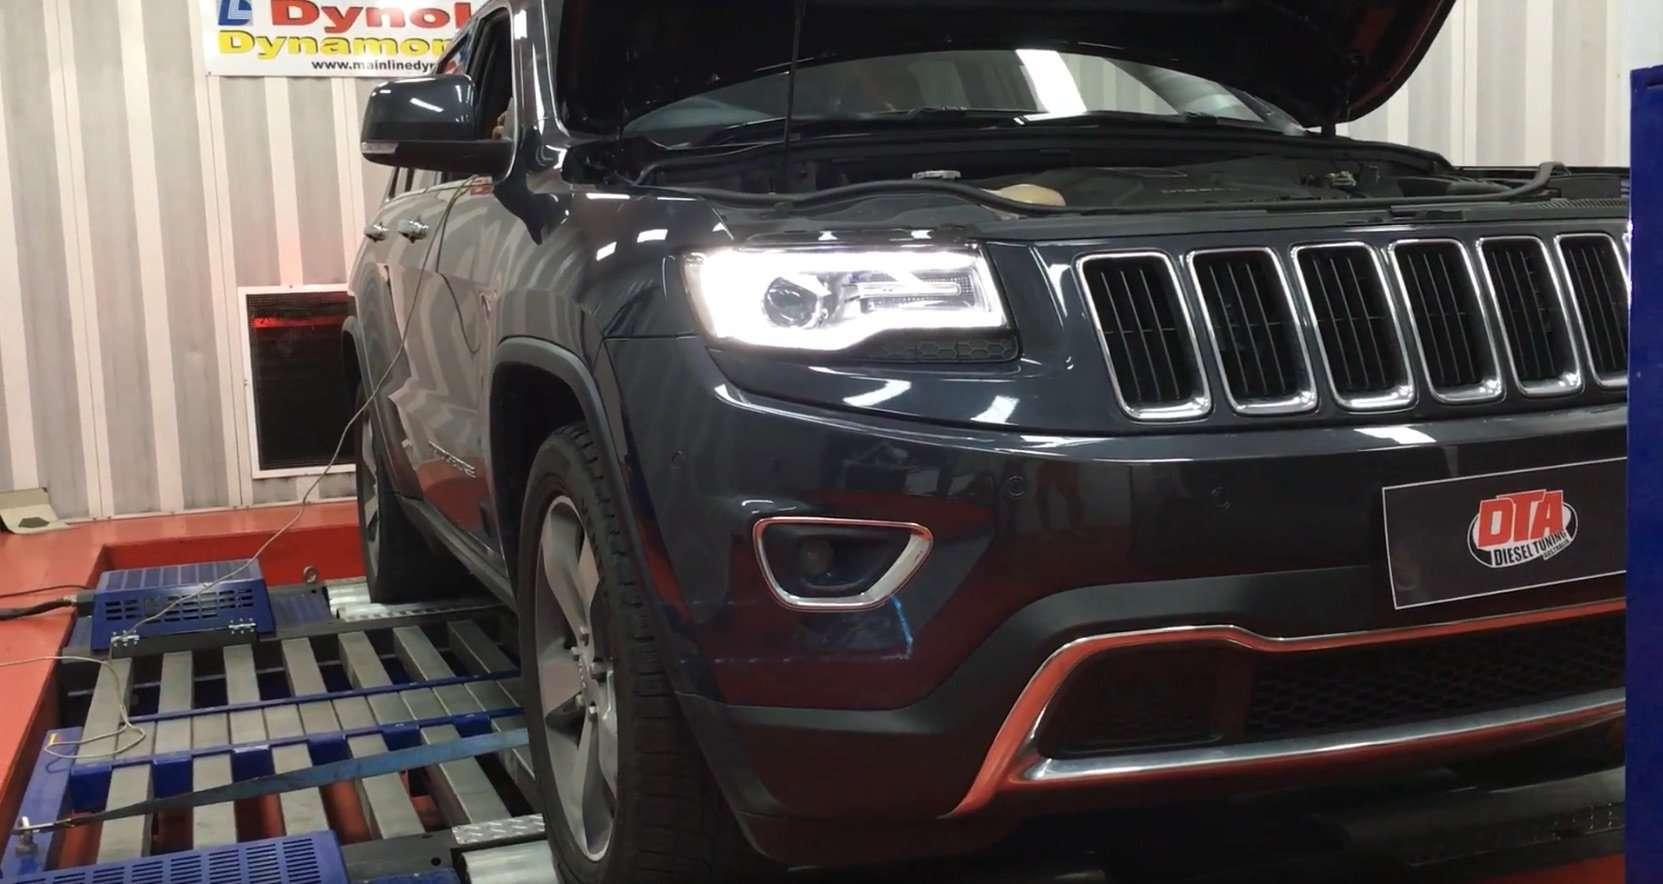 Jeep Grand Cherokee 3.0L 184 kW ECU REMAP - Diesel tuning ...